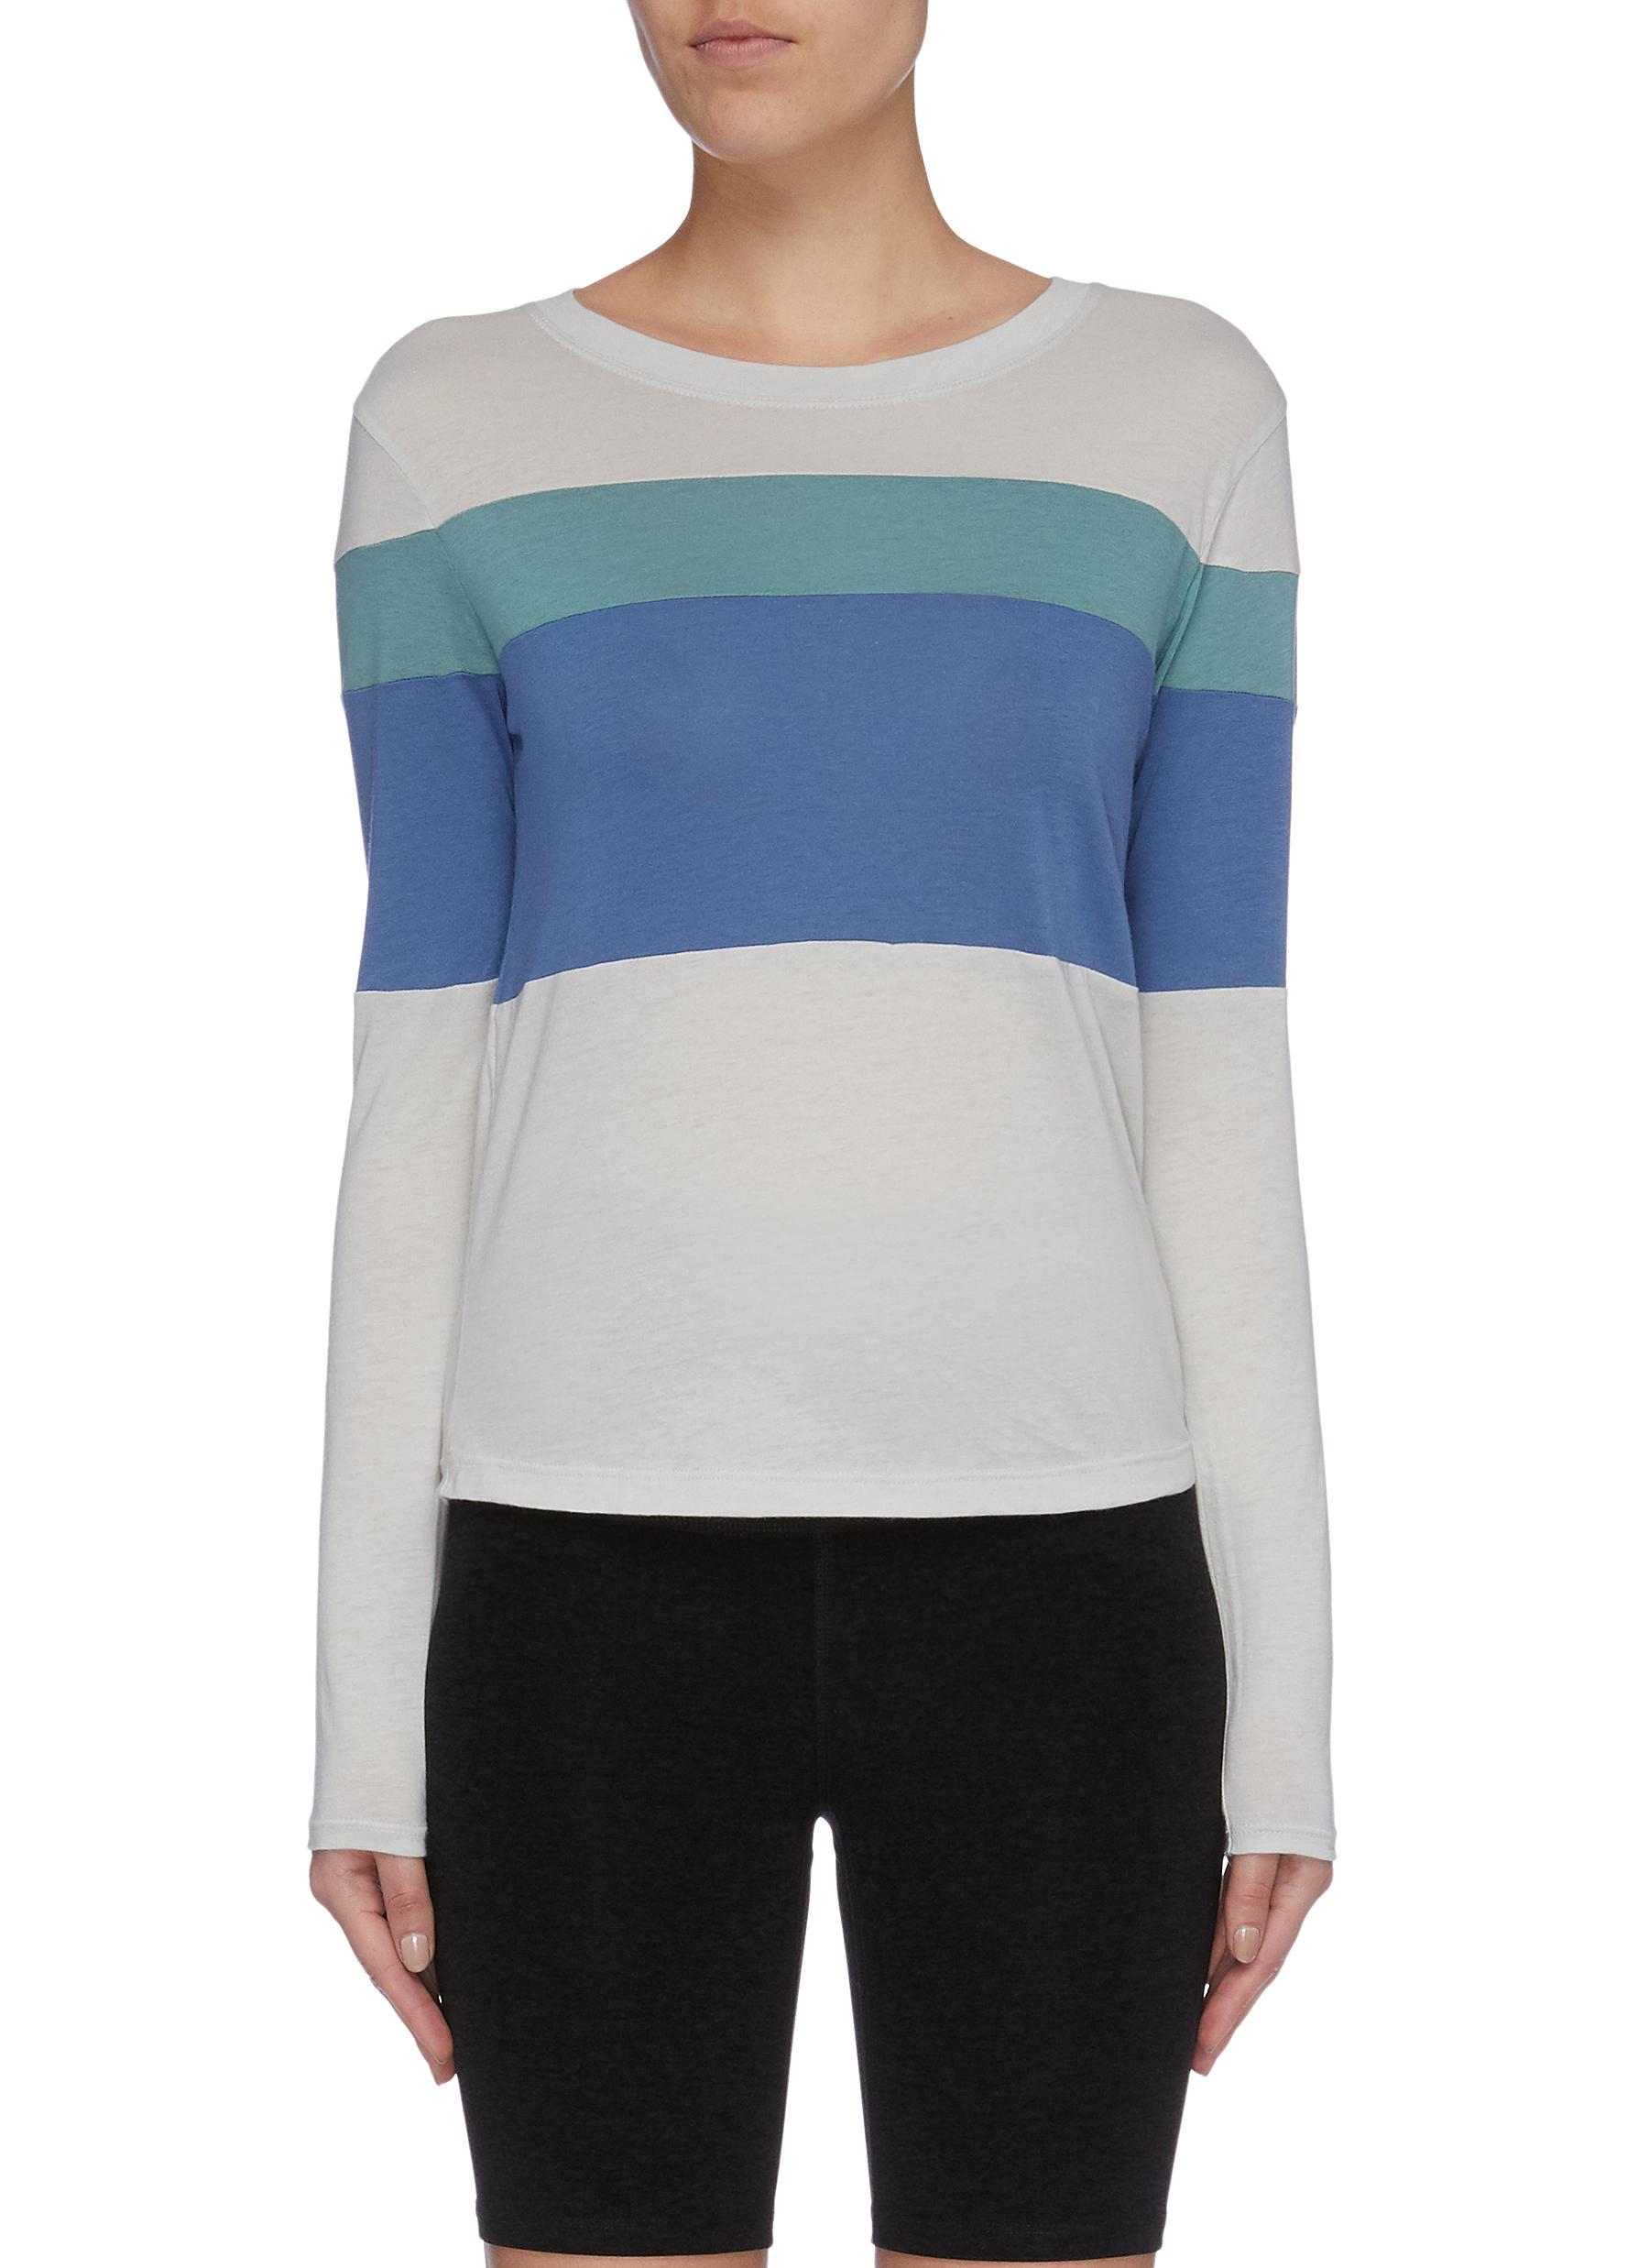 Colourblock panelled sweatshirt by Beyond Yoga